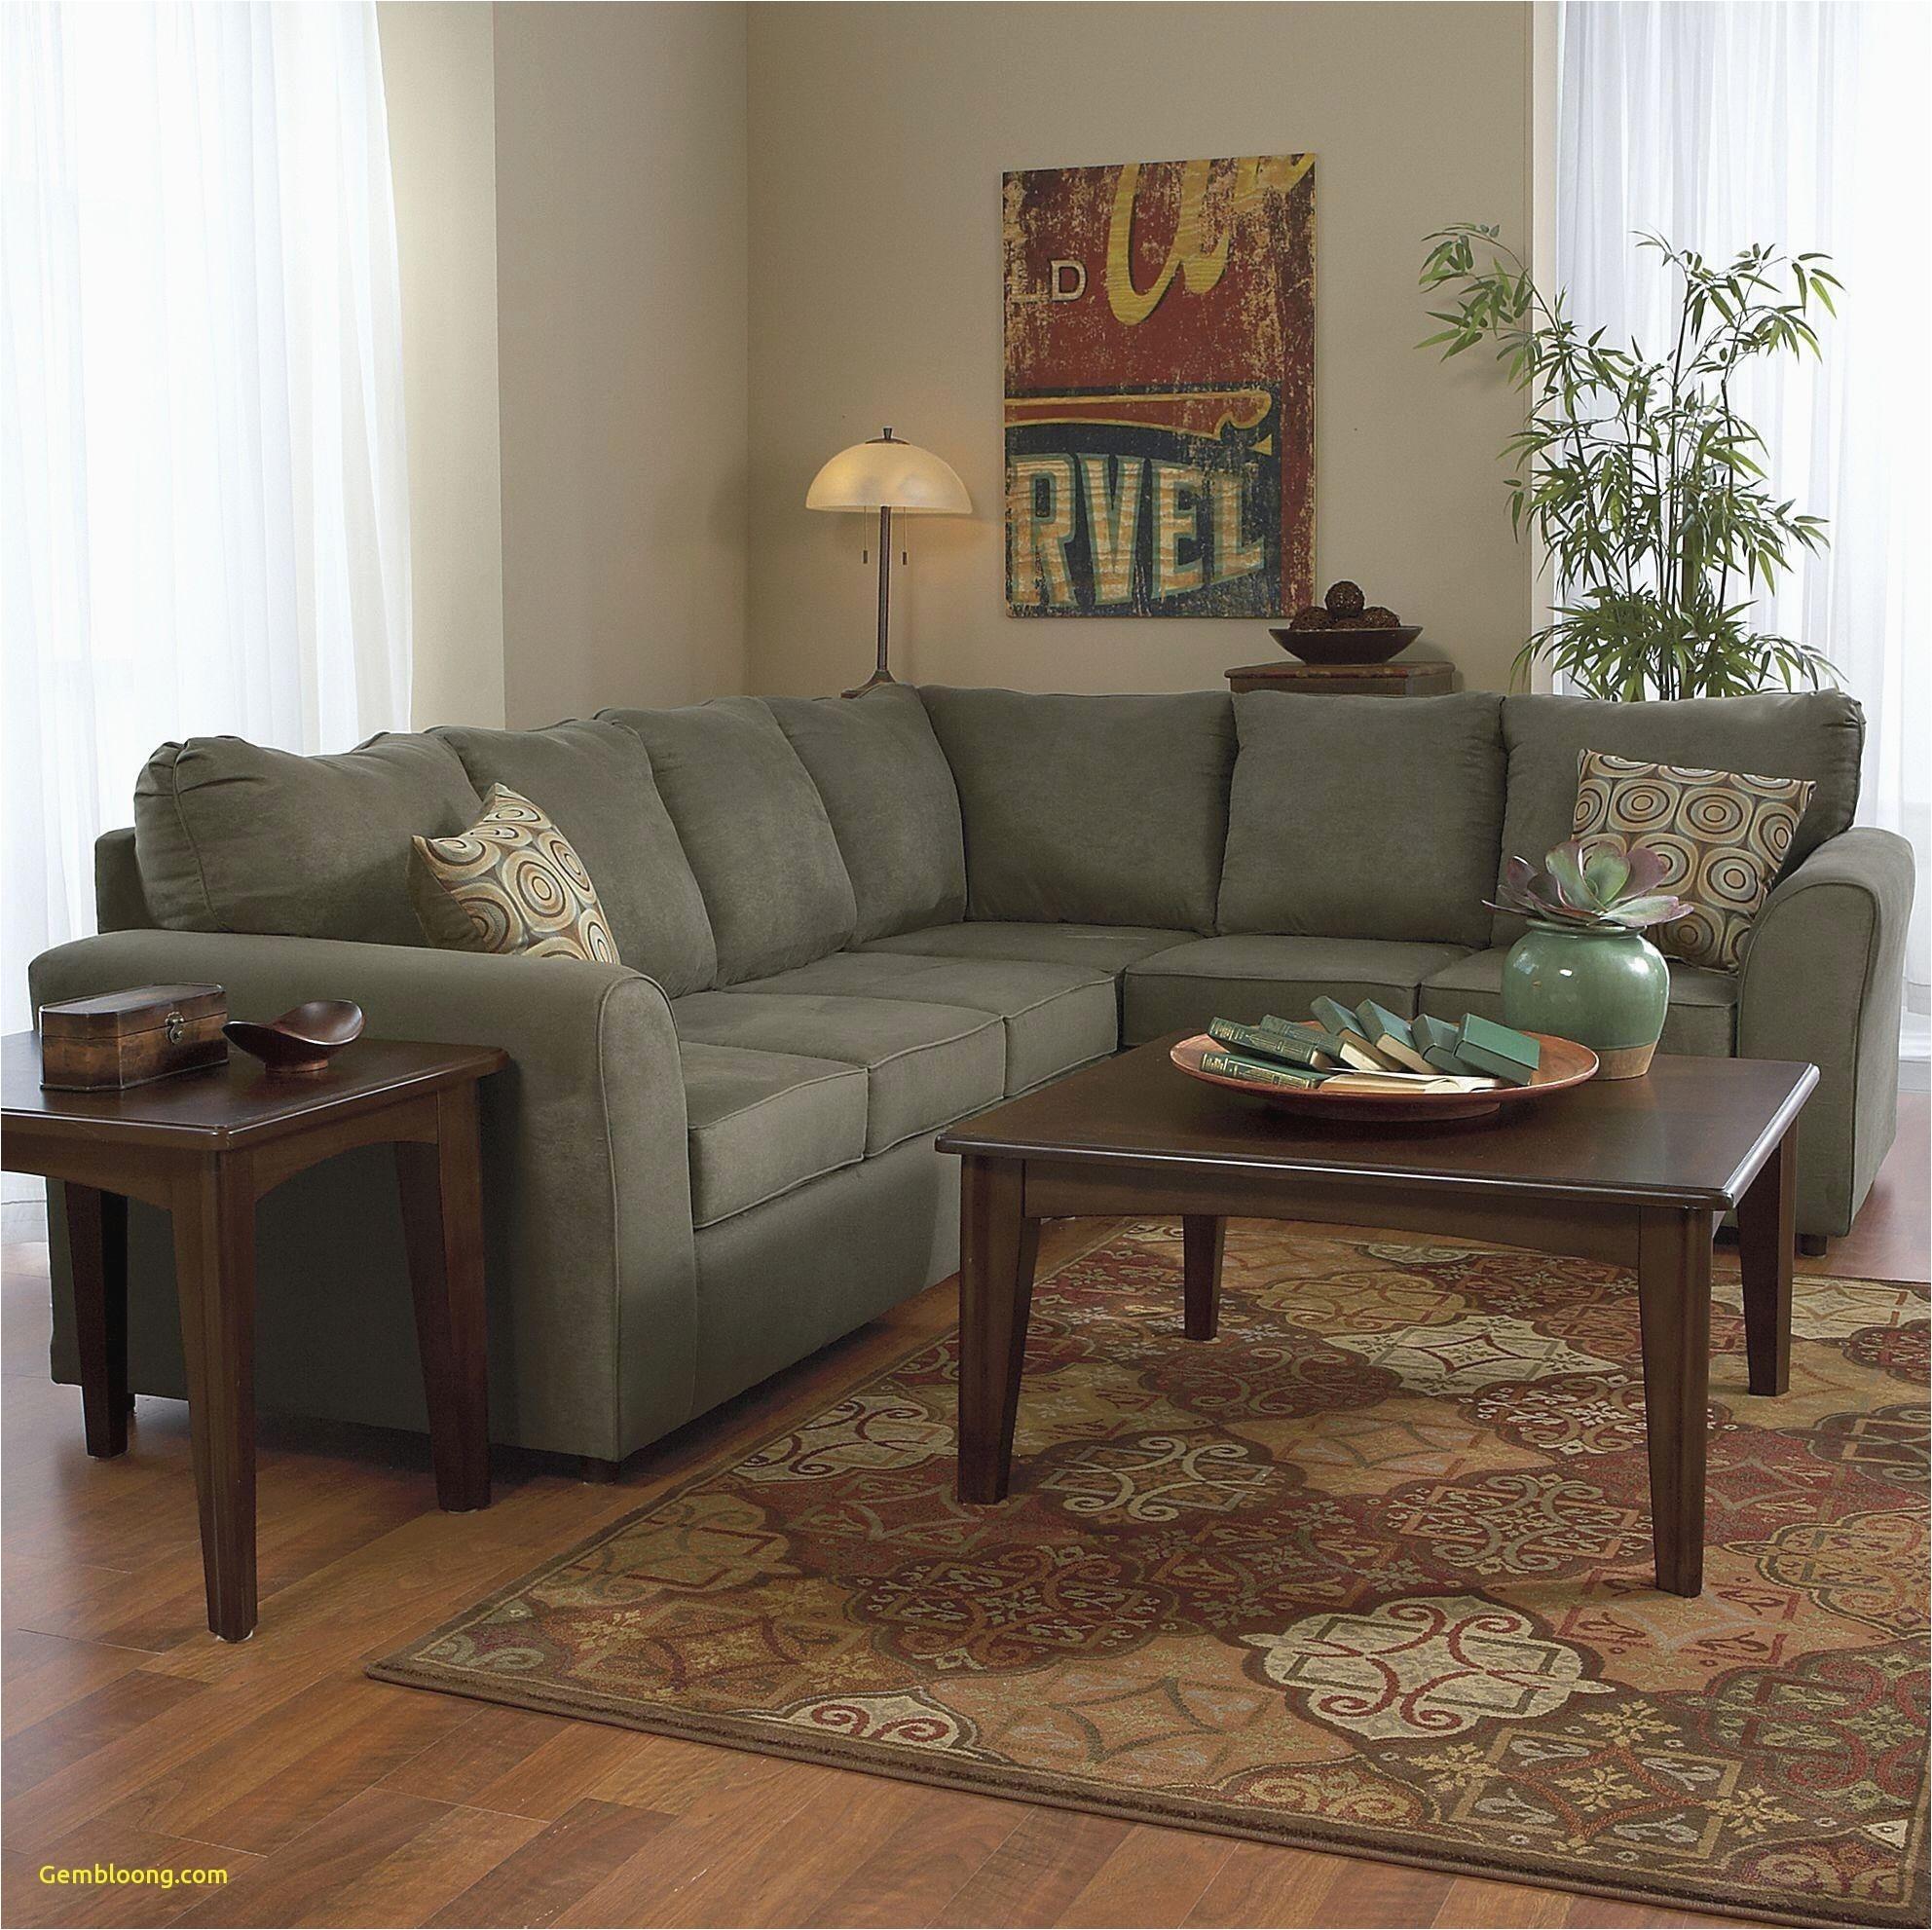 American Furniture Denver Co 25 Beautiful Of American Home Furniture Denver Pics Home Furniture